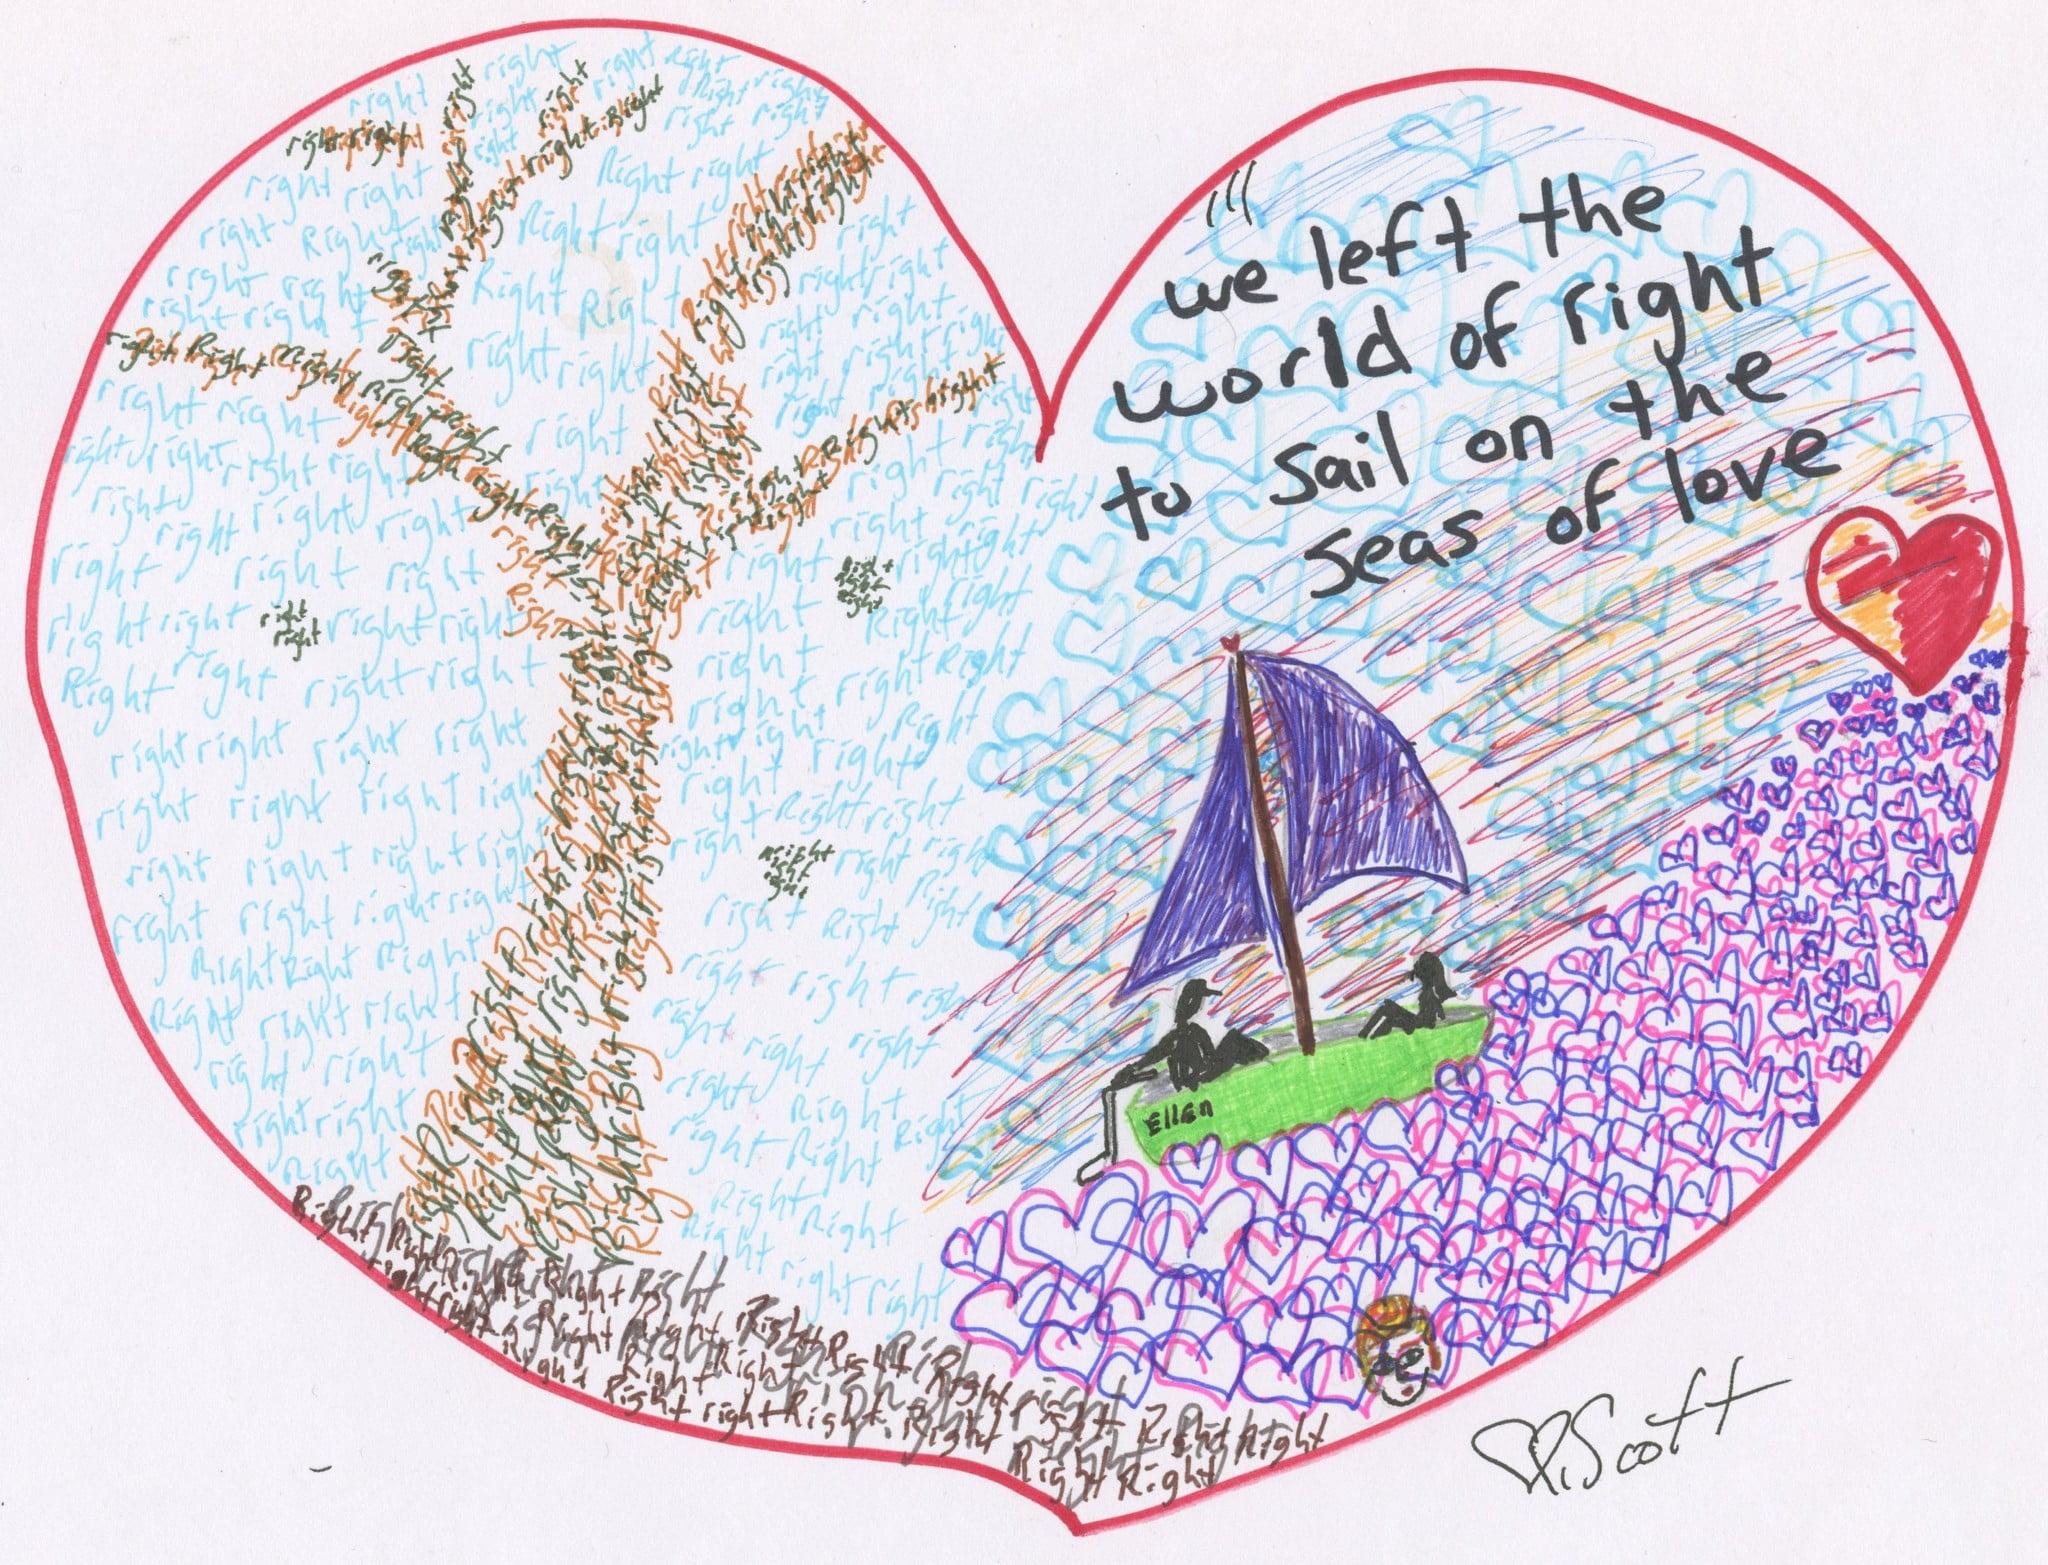 sail, love, right, left, christian